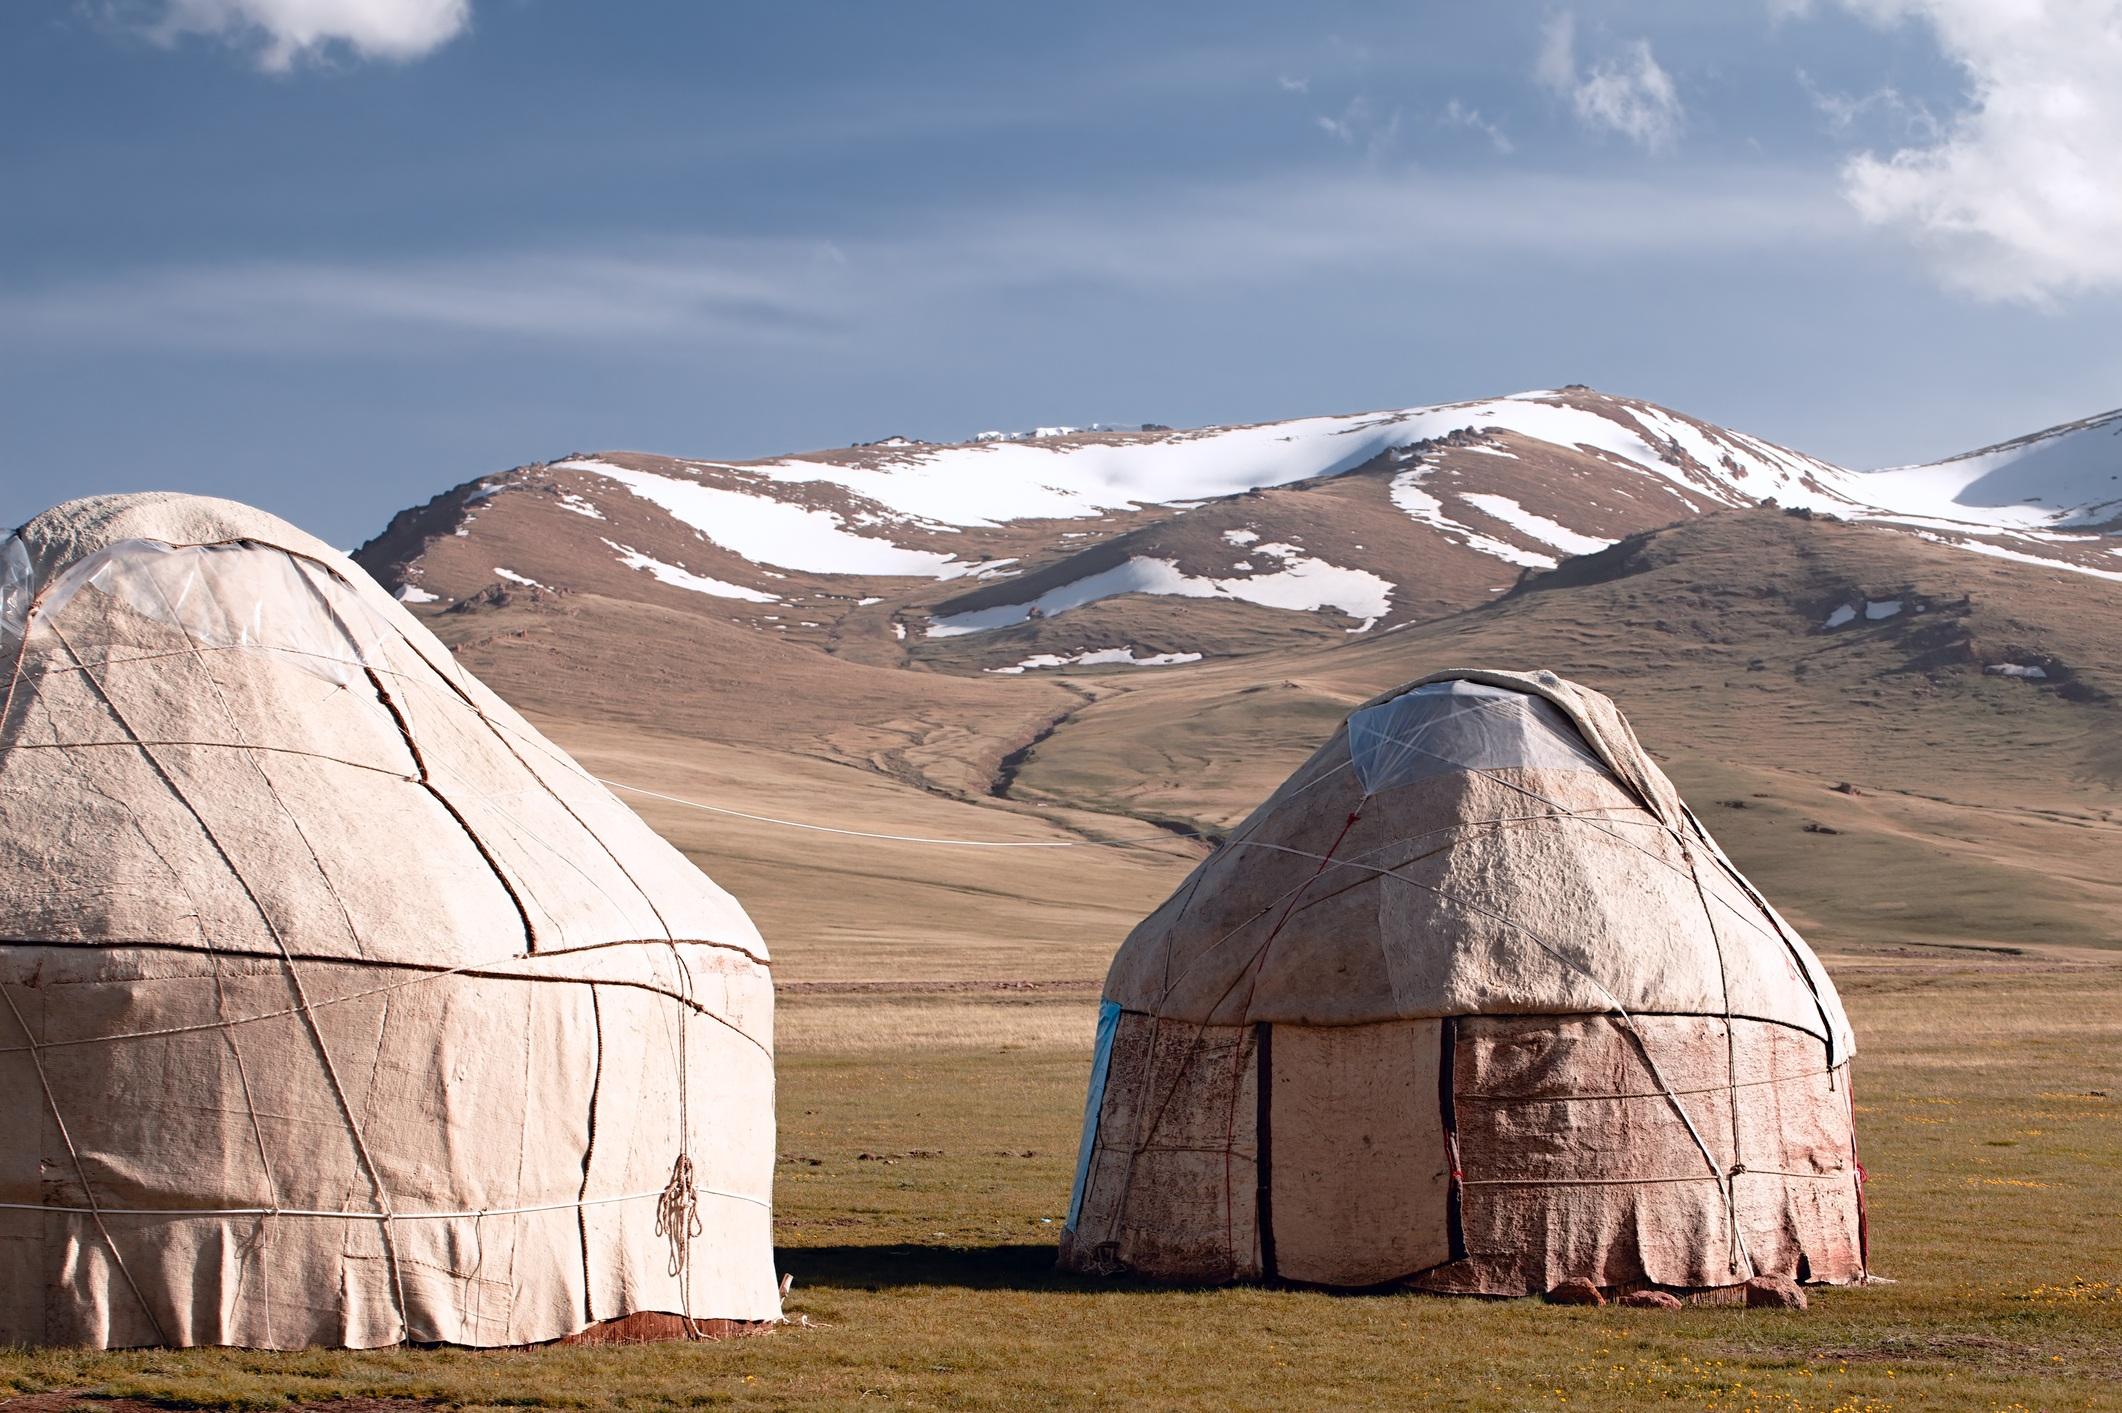 real shepherd yurt in kyrgyzstan Tien Shan mountain